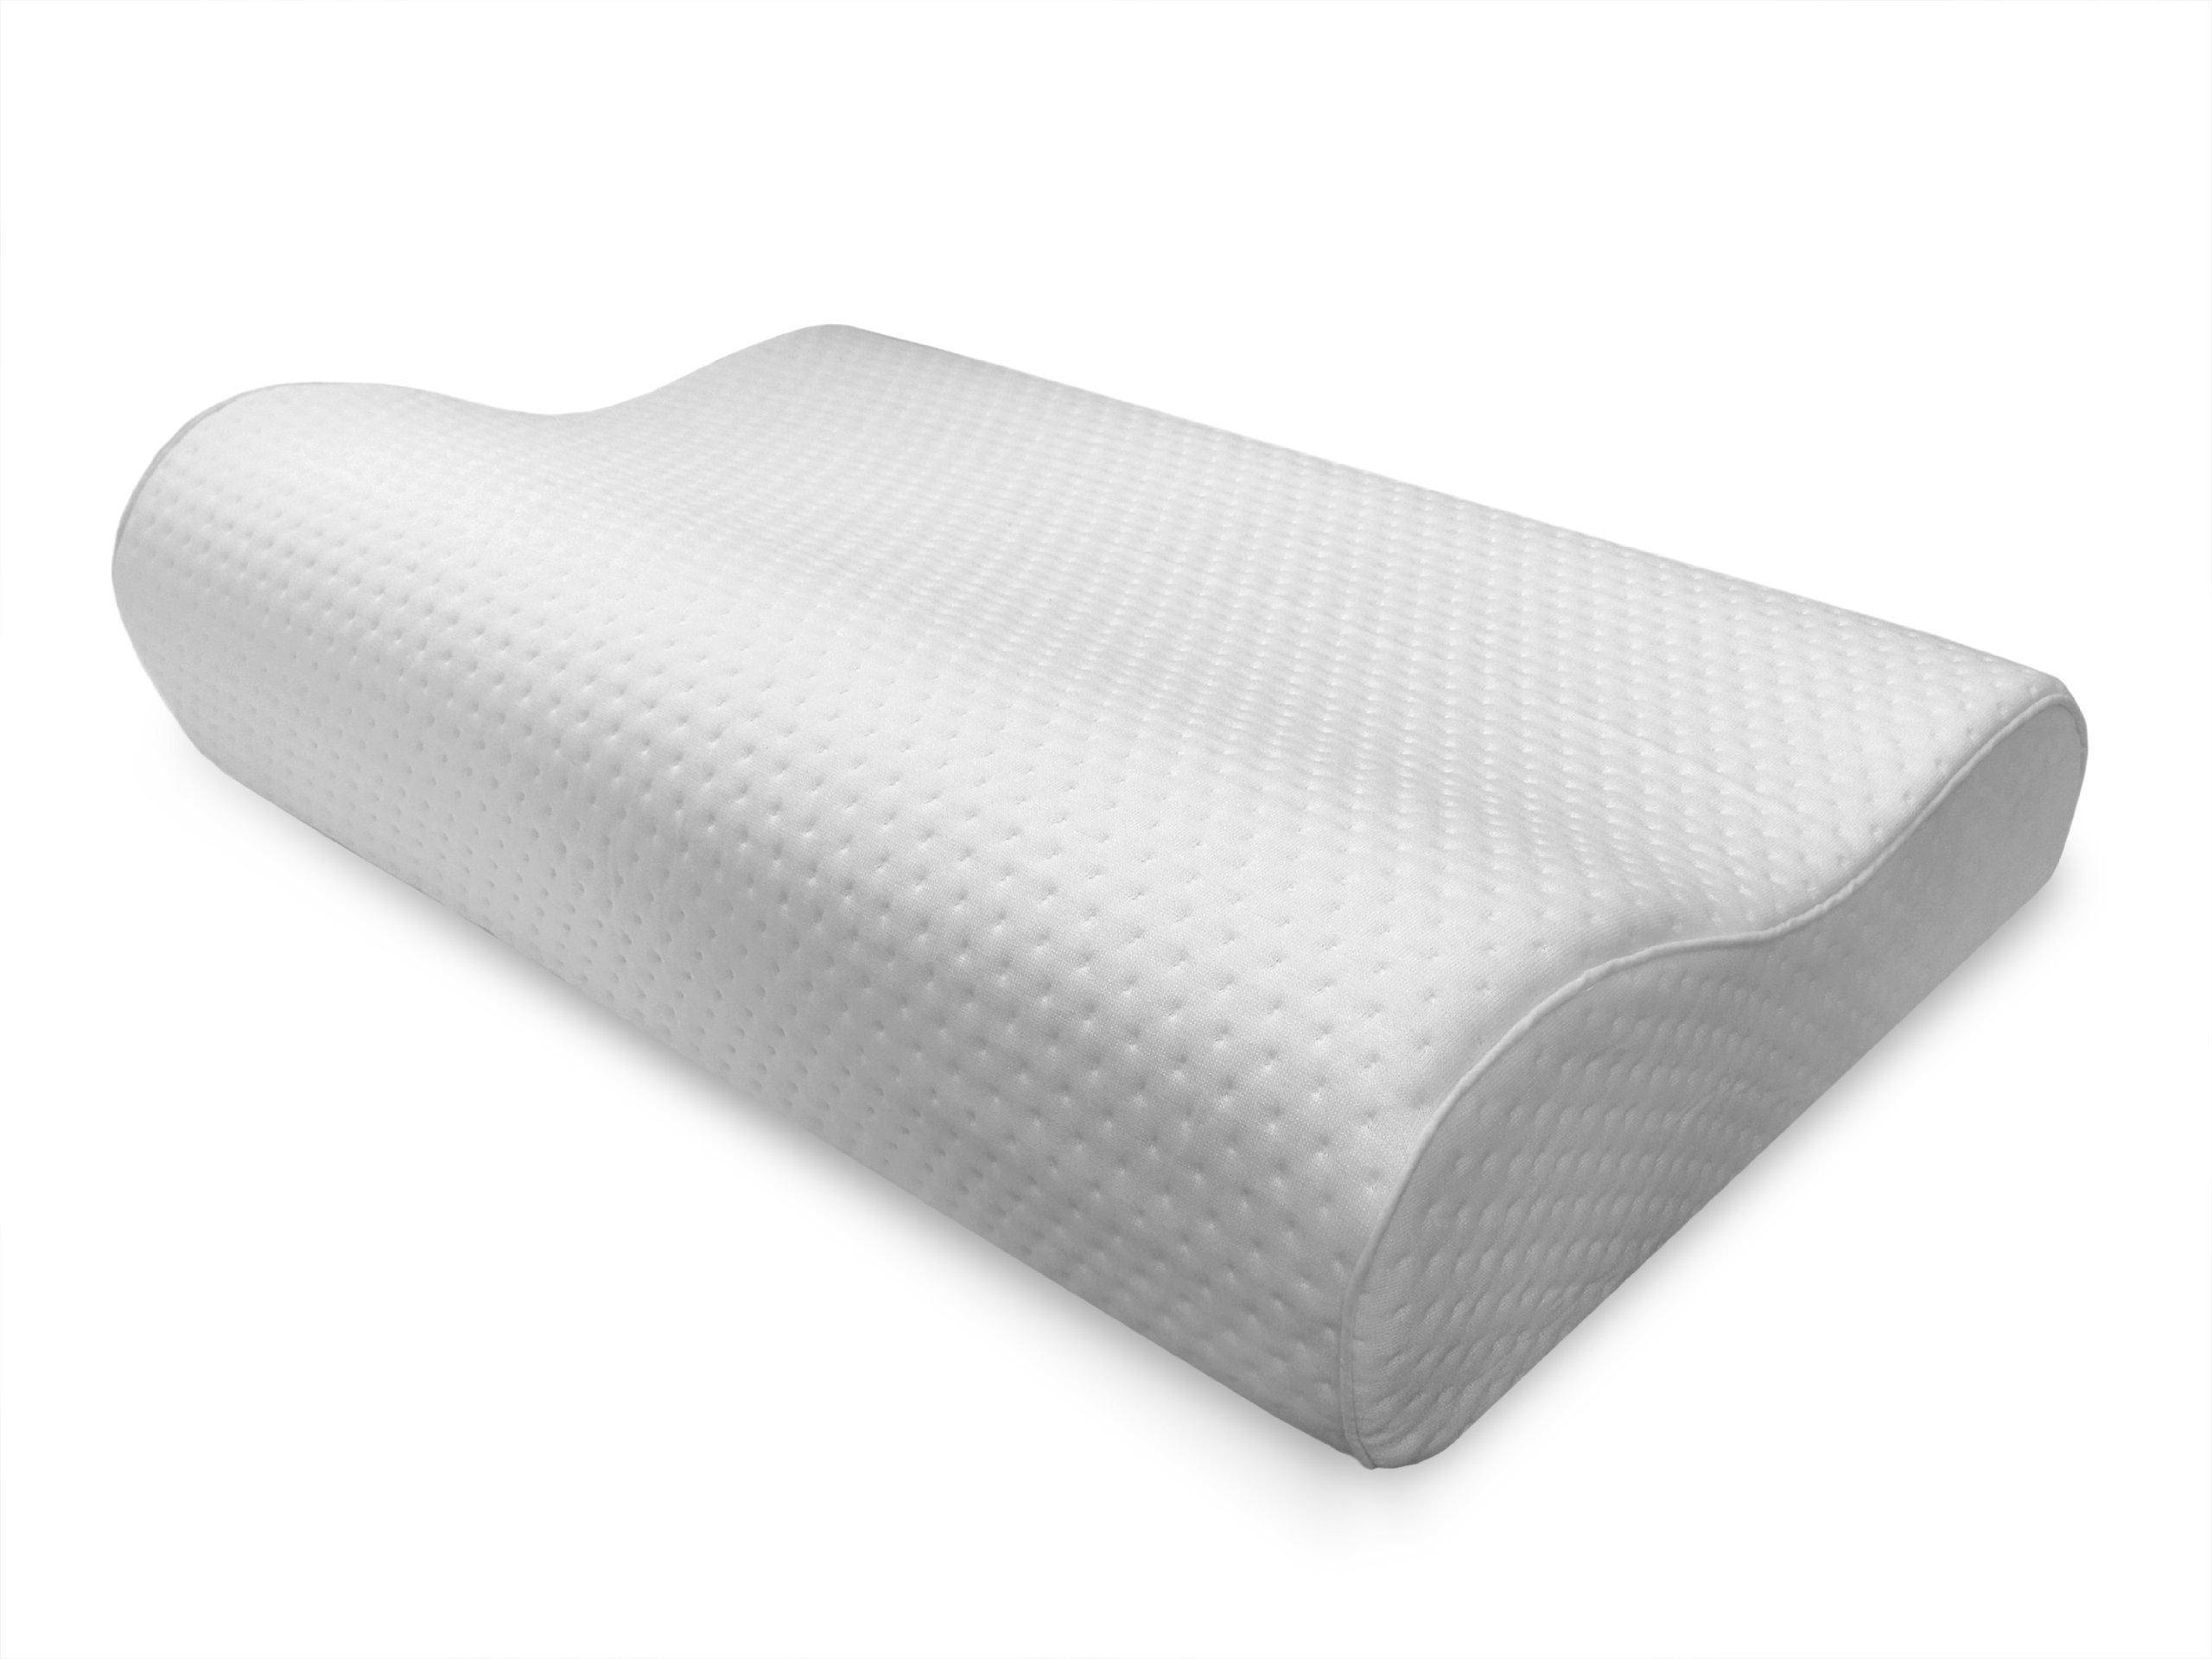 Sensorpedic Luxury Extraordinaire Contour Memory Foam Neck Pillow with Ventilated Icool Technology, Jumbo Size, White